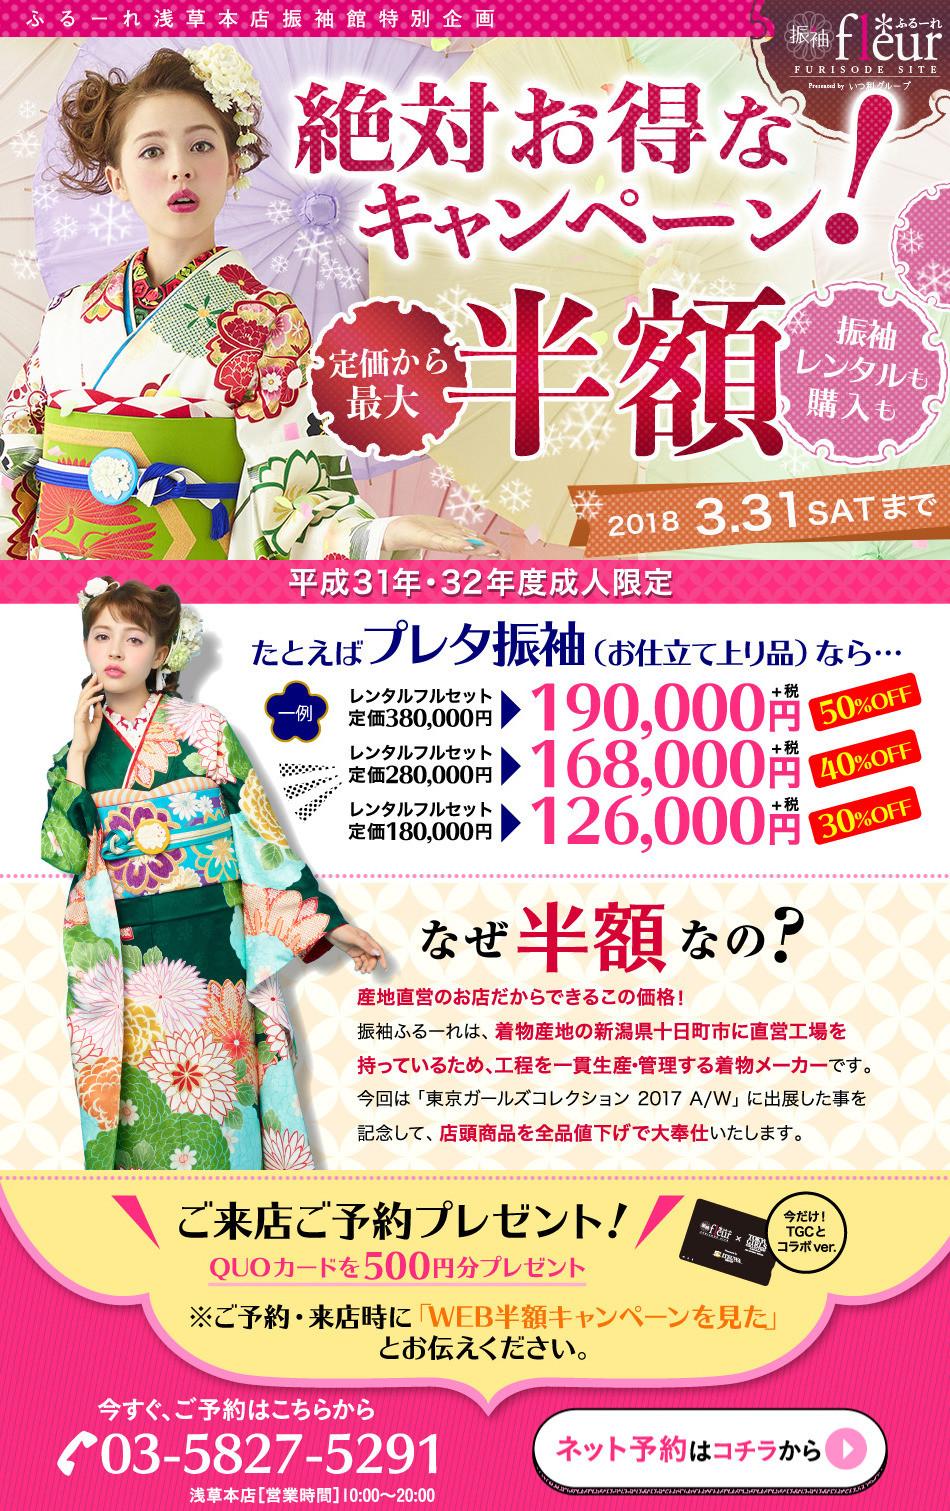 FireShot Capture 154 - 浅草店限定決算総力祭%8-iloveimg-converted